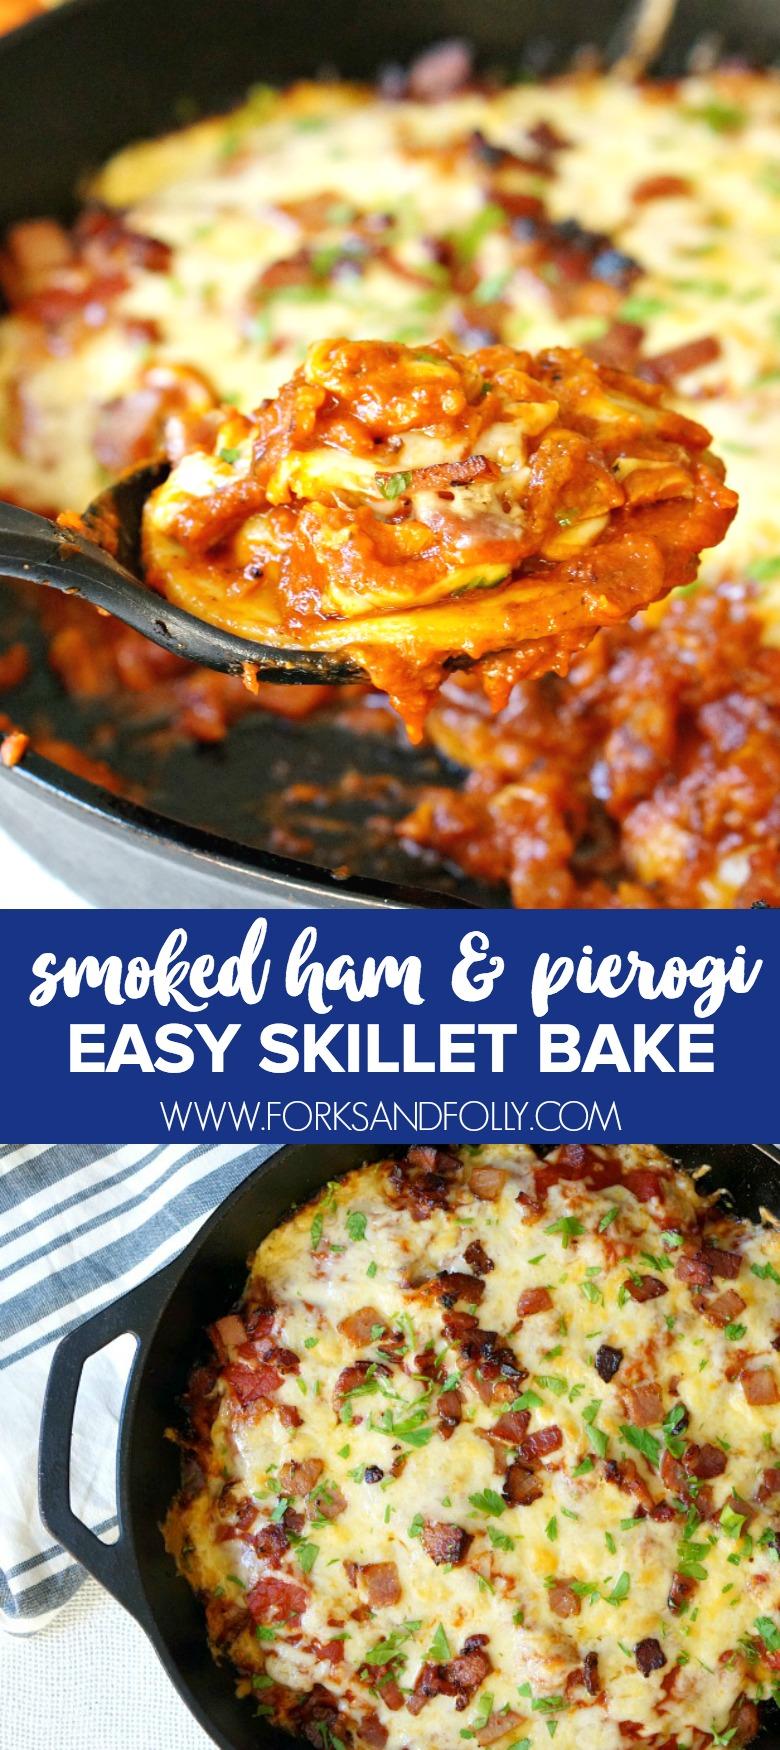 Easy Smoked Ham and Pierogi Skillet